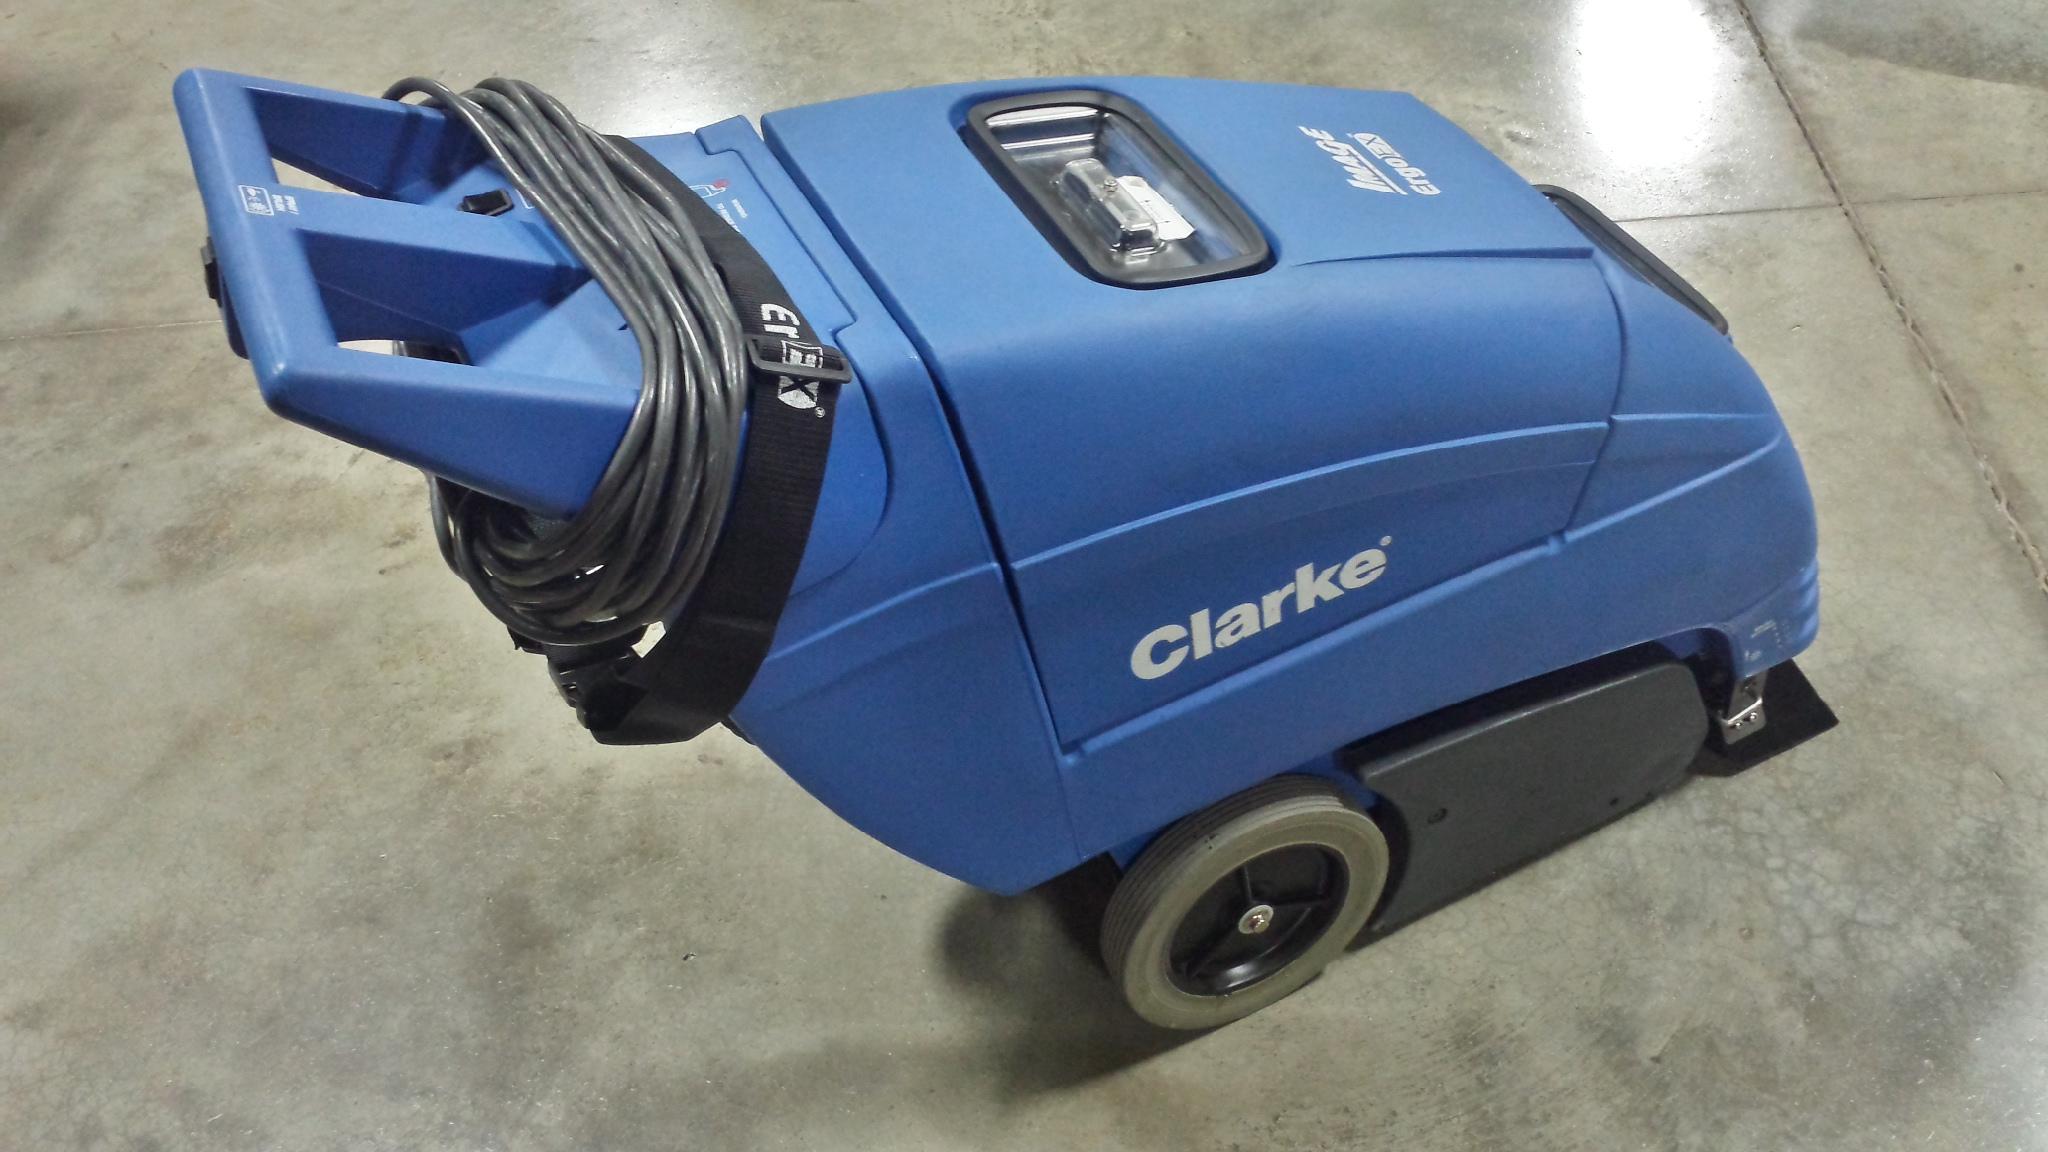 clarke carpet extractor instructions